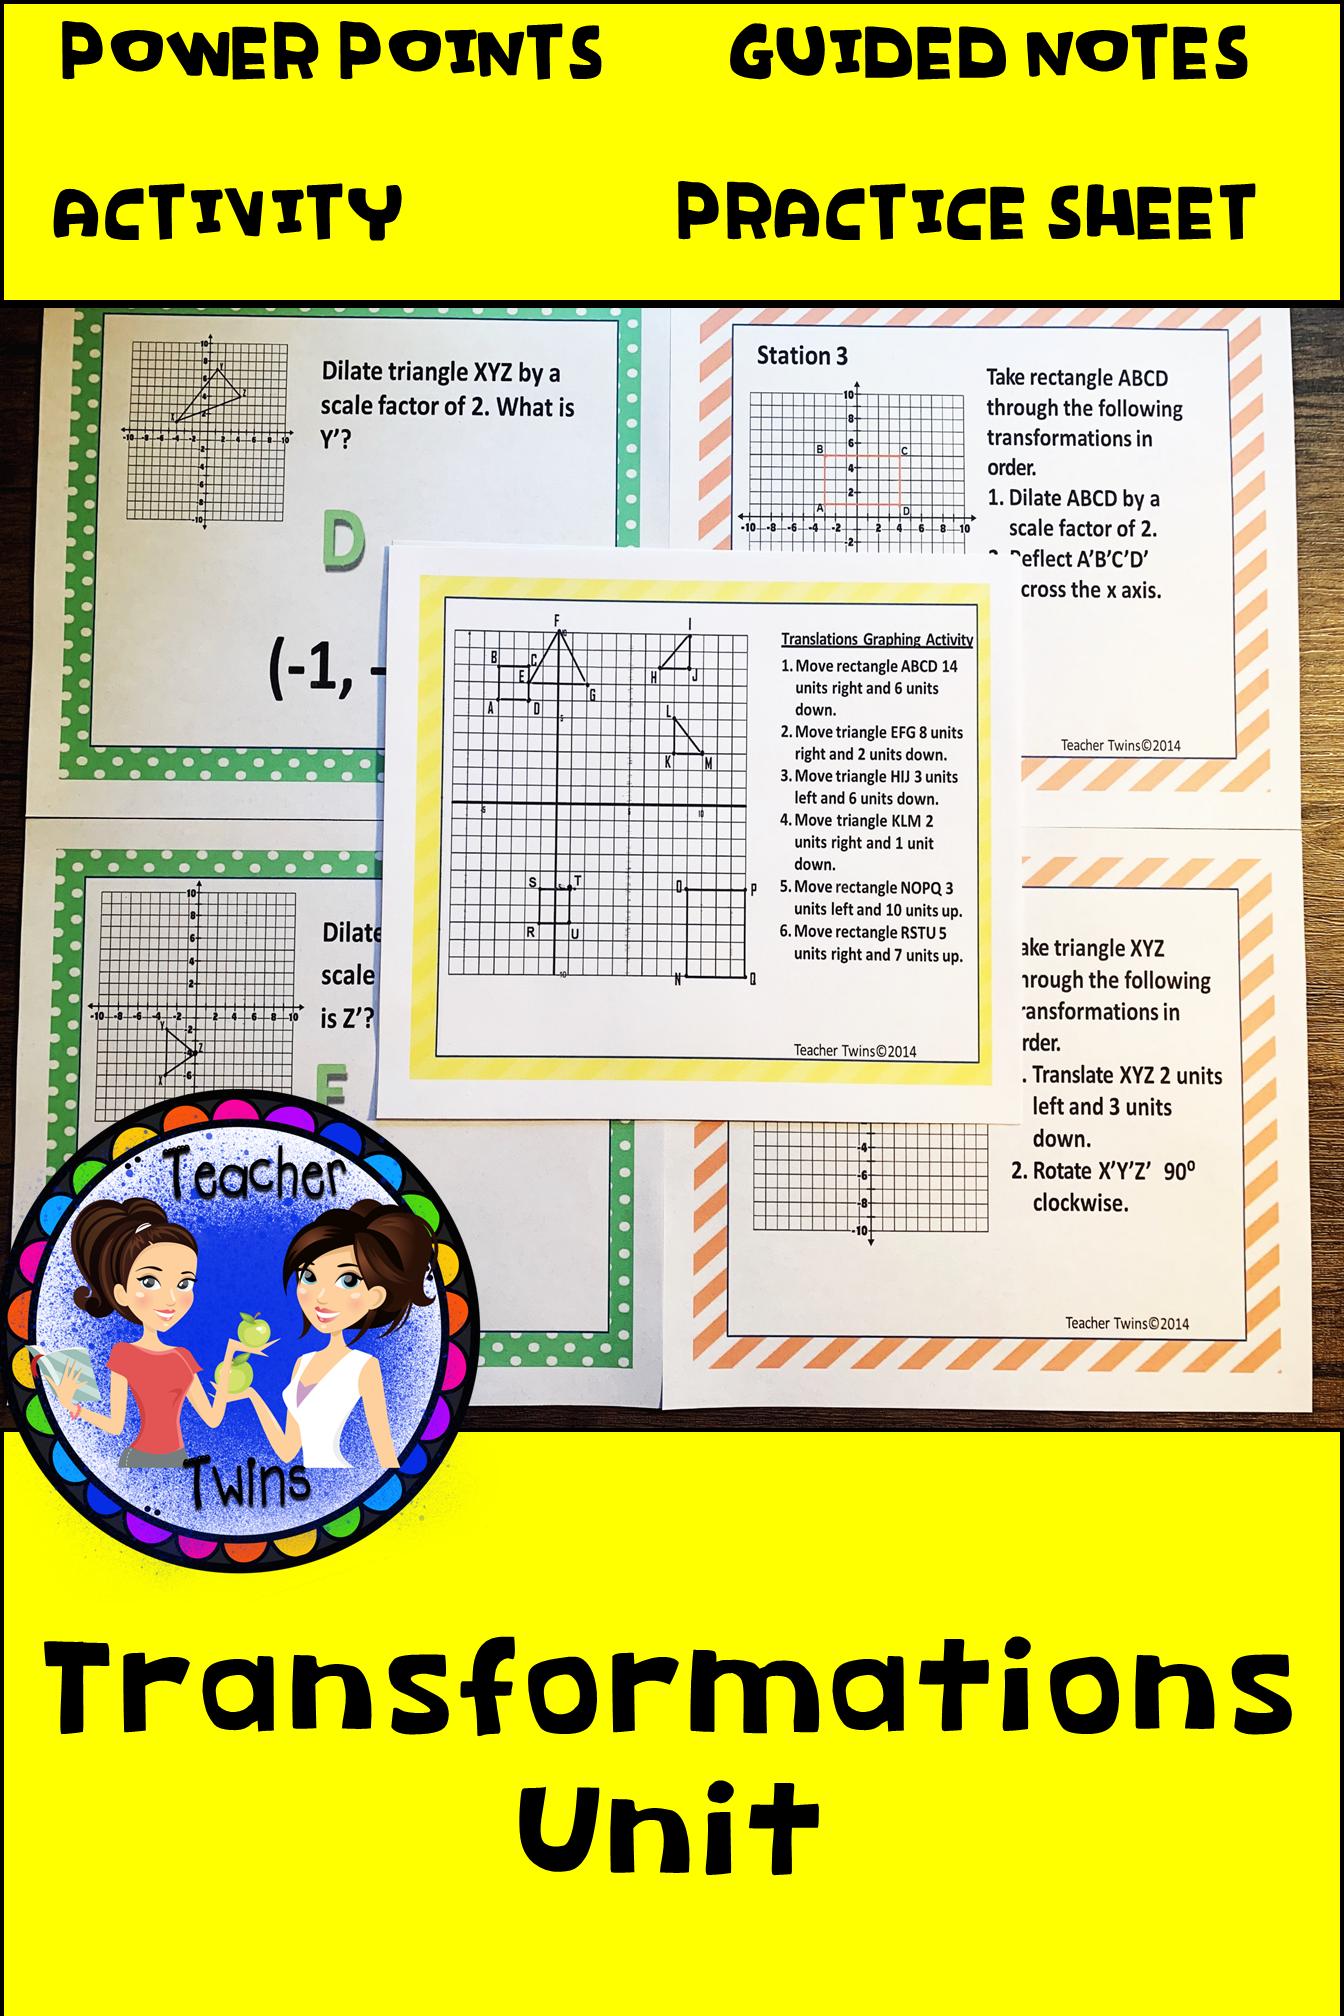 Transformations Unit Common Core Standards 8 G 2 8 G 3 8